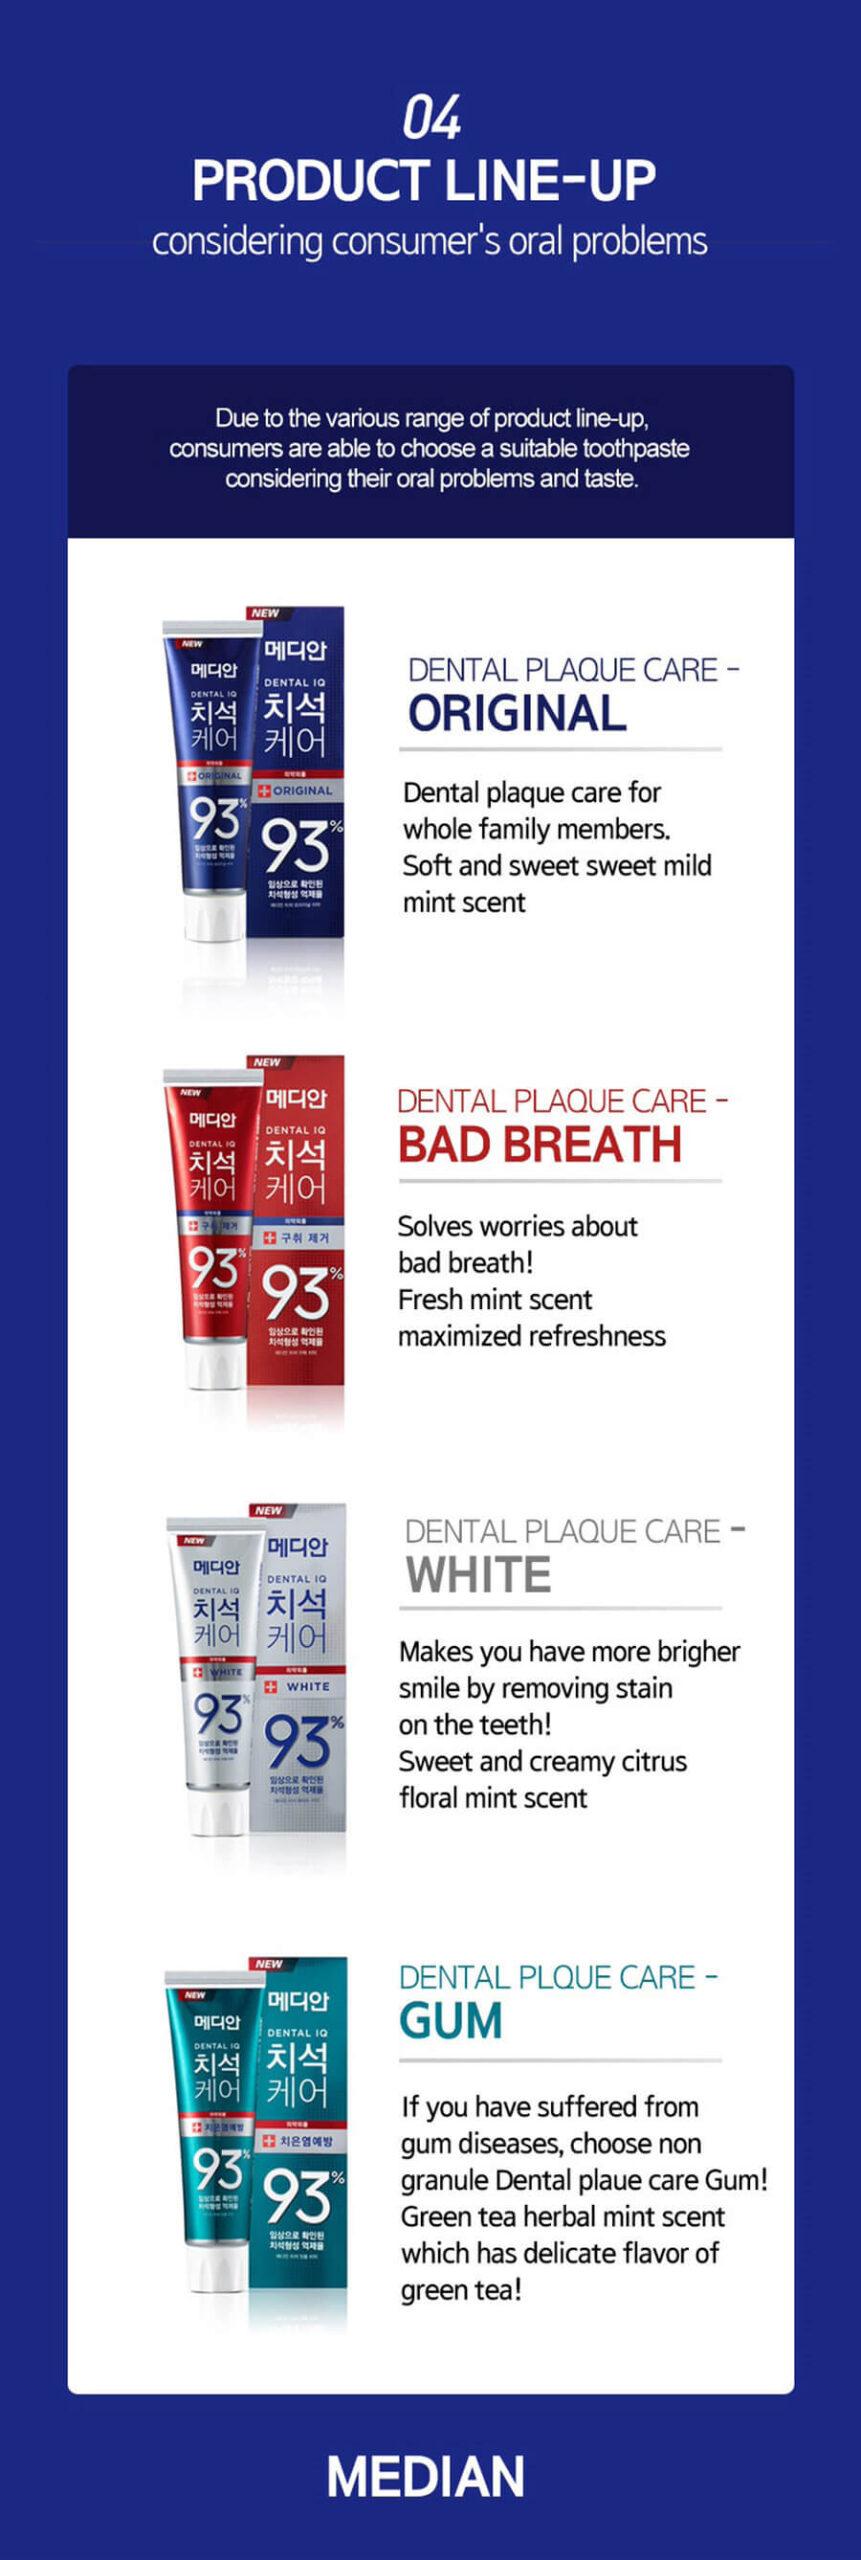 Dental IQ Toothpaste Original - Types